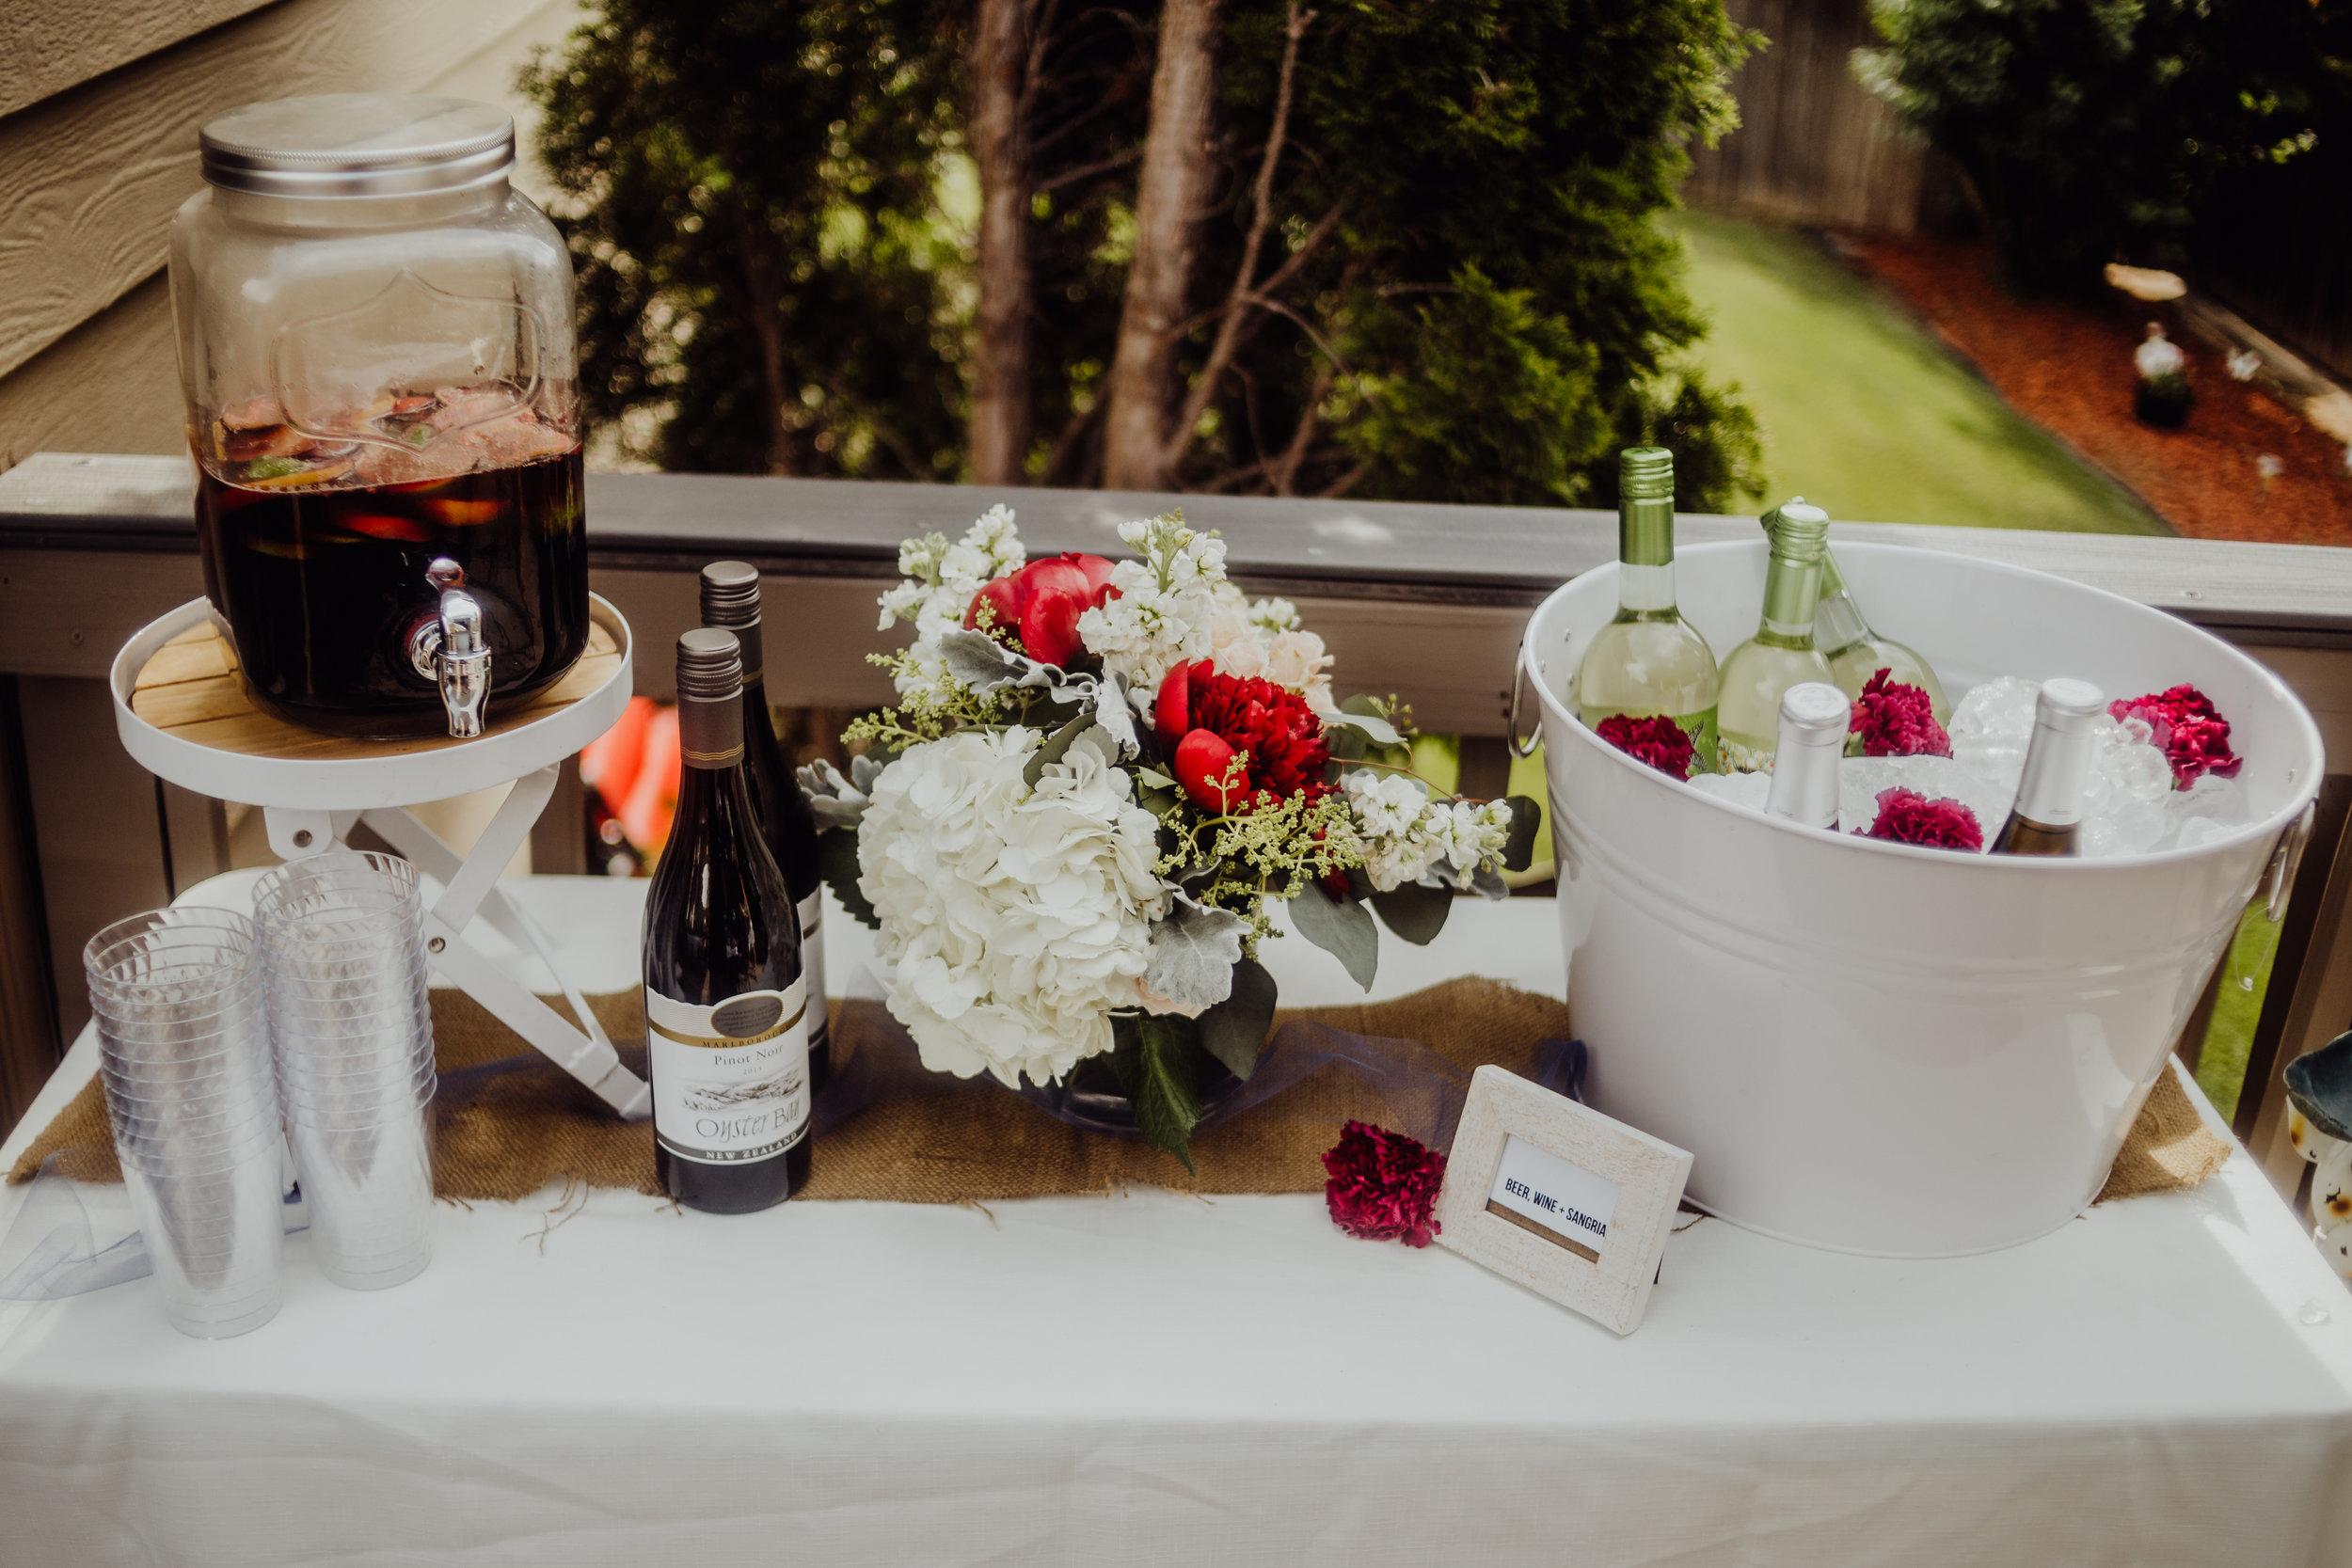 lindsay-arlene-photography-bridal-shower(14of106).jpg